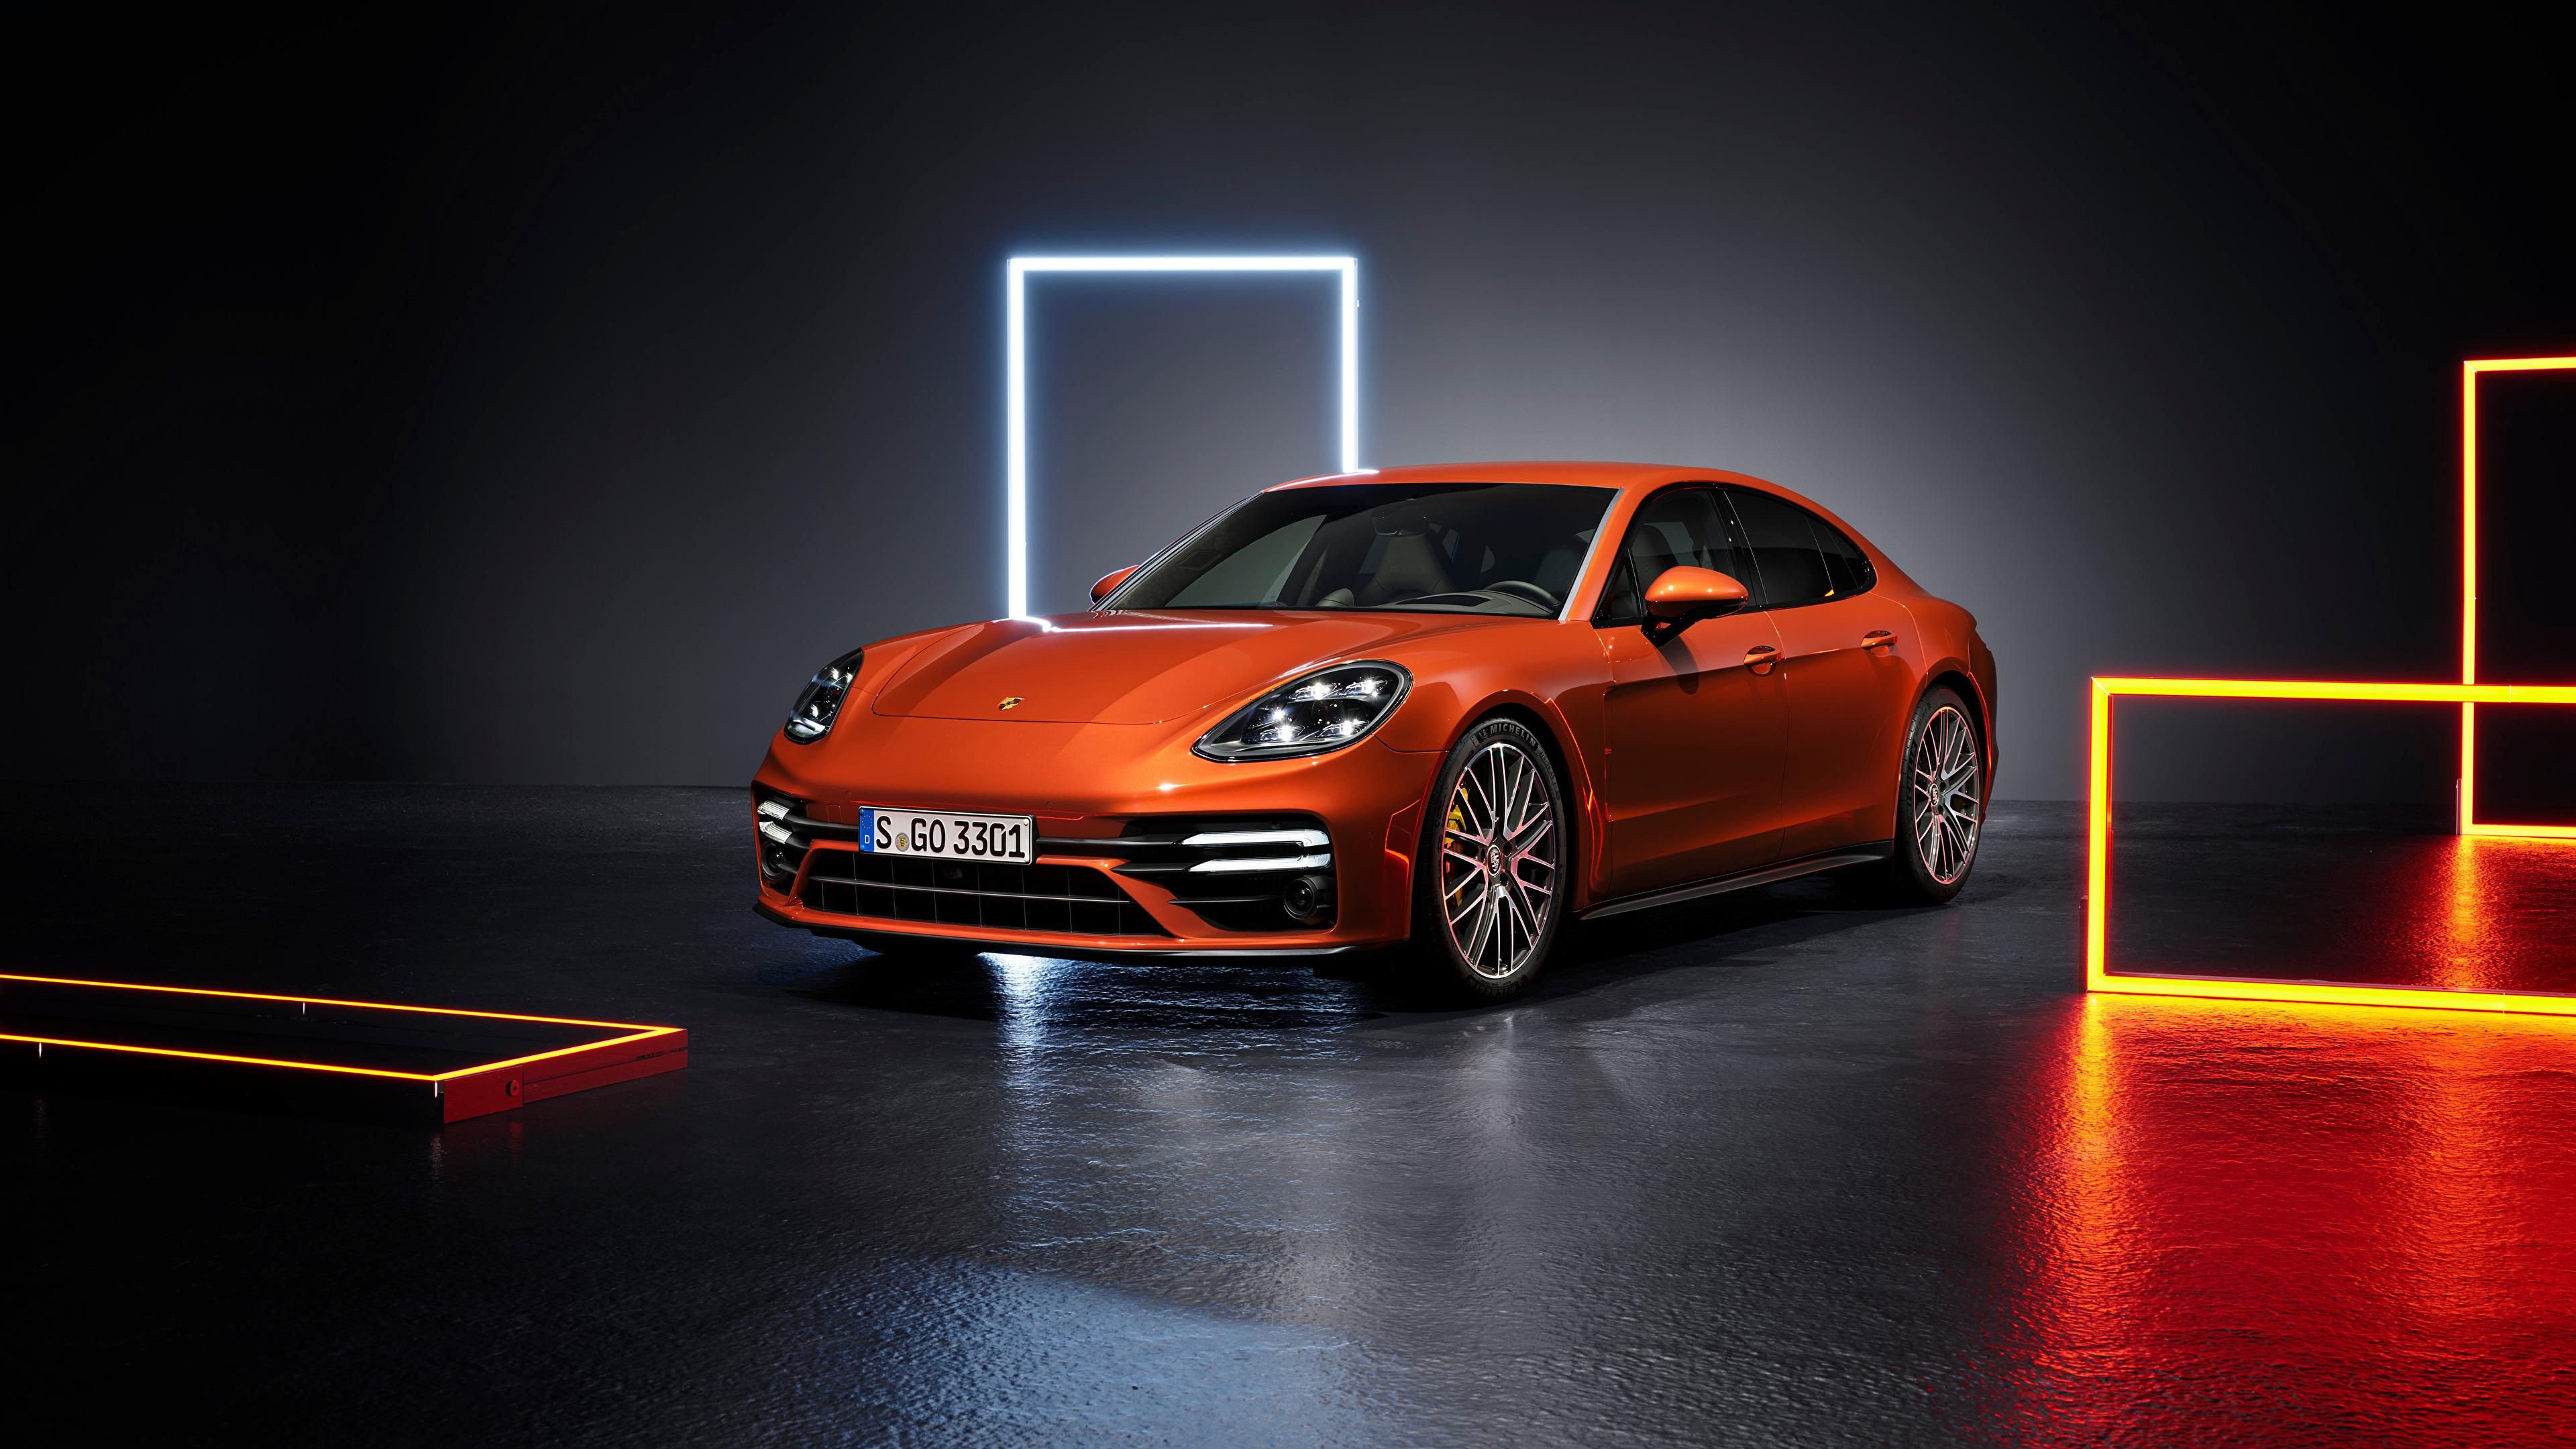 Фото Порше Panamera Turbo S (971), 2020 оранжевые машина Металлик 3840x2160 Porsche оранжевая Оранжевый оранжевых авто машины Автомобили автомобиль